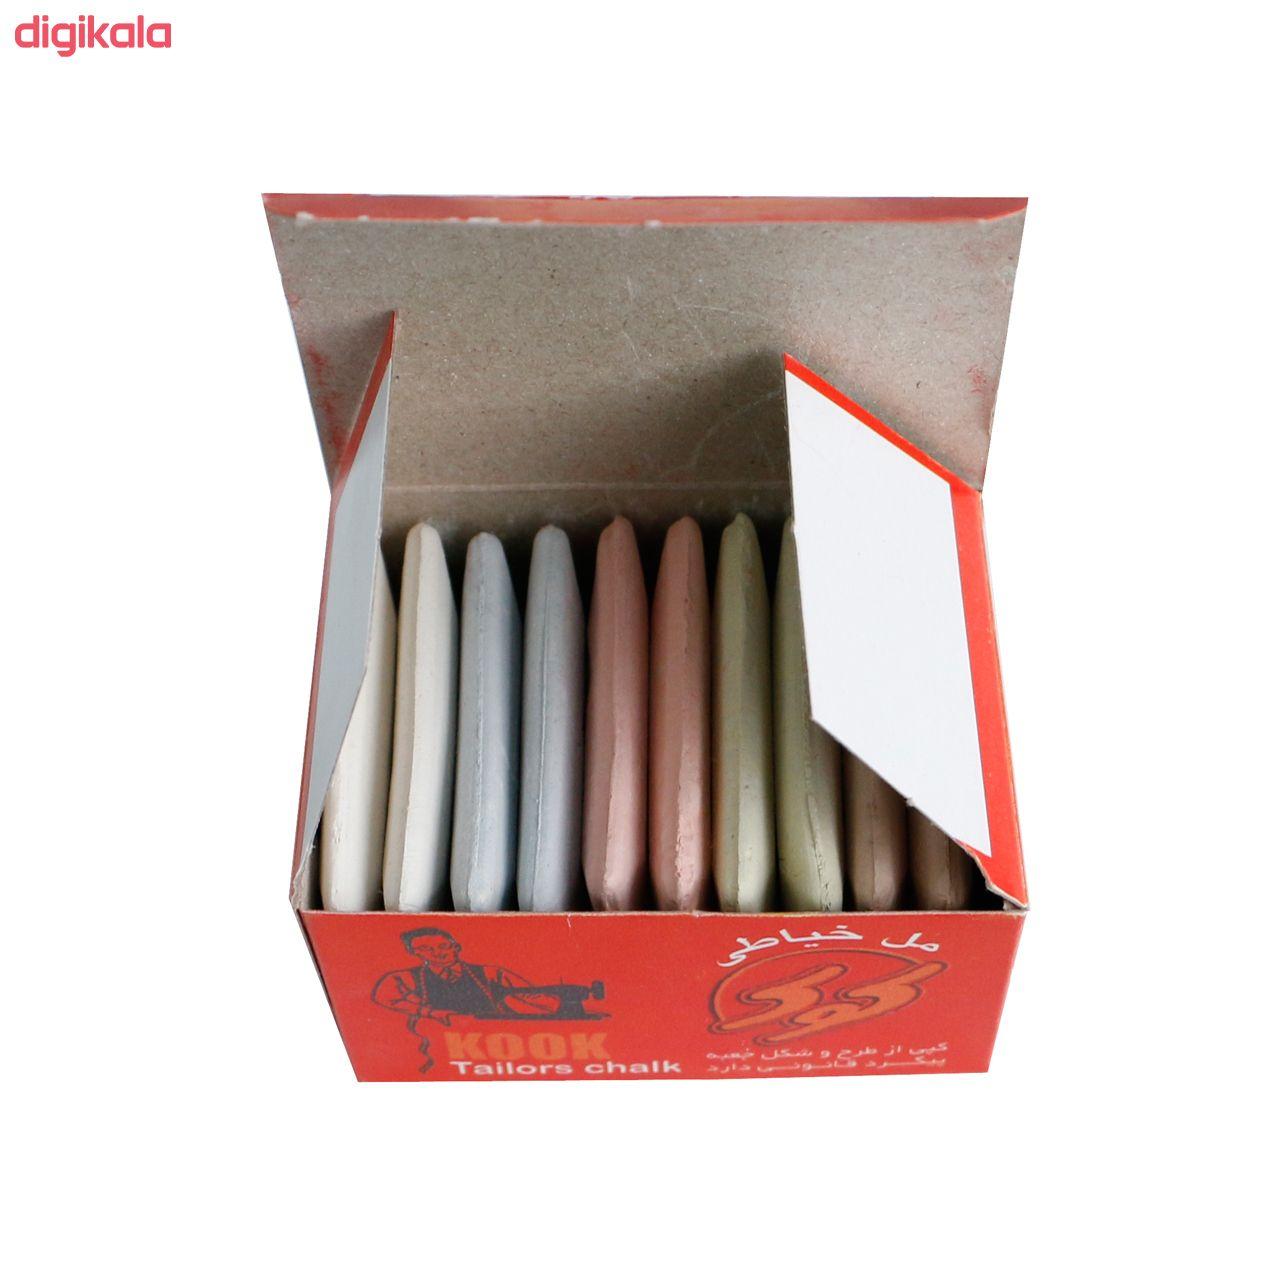 صابون خیاطی کوک مدل SCH10 بسته 10 عددی  main 1 2